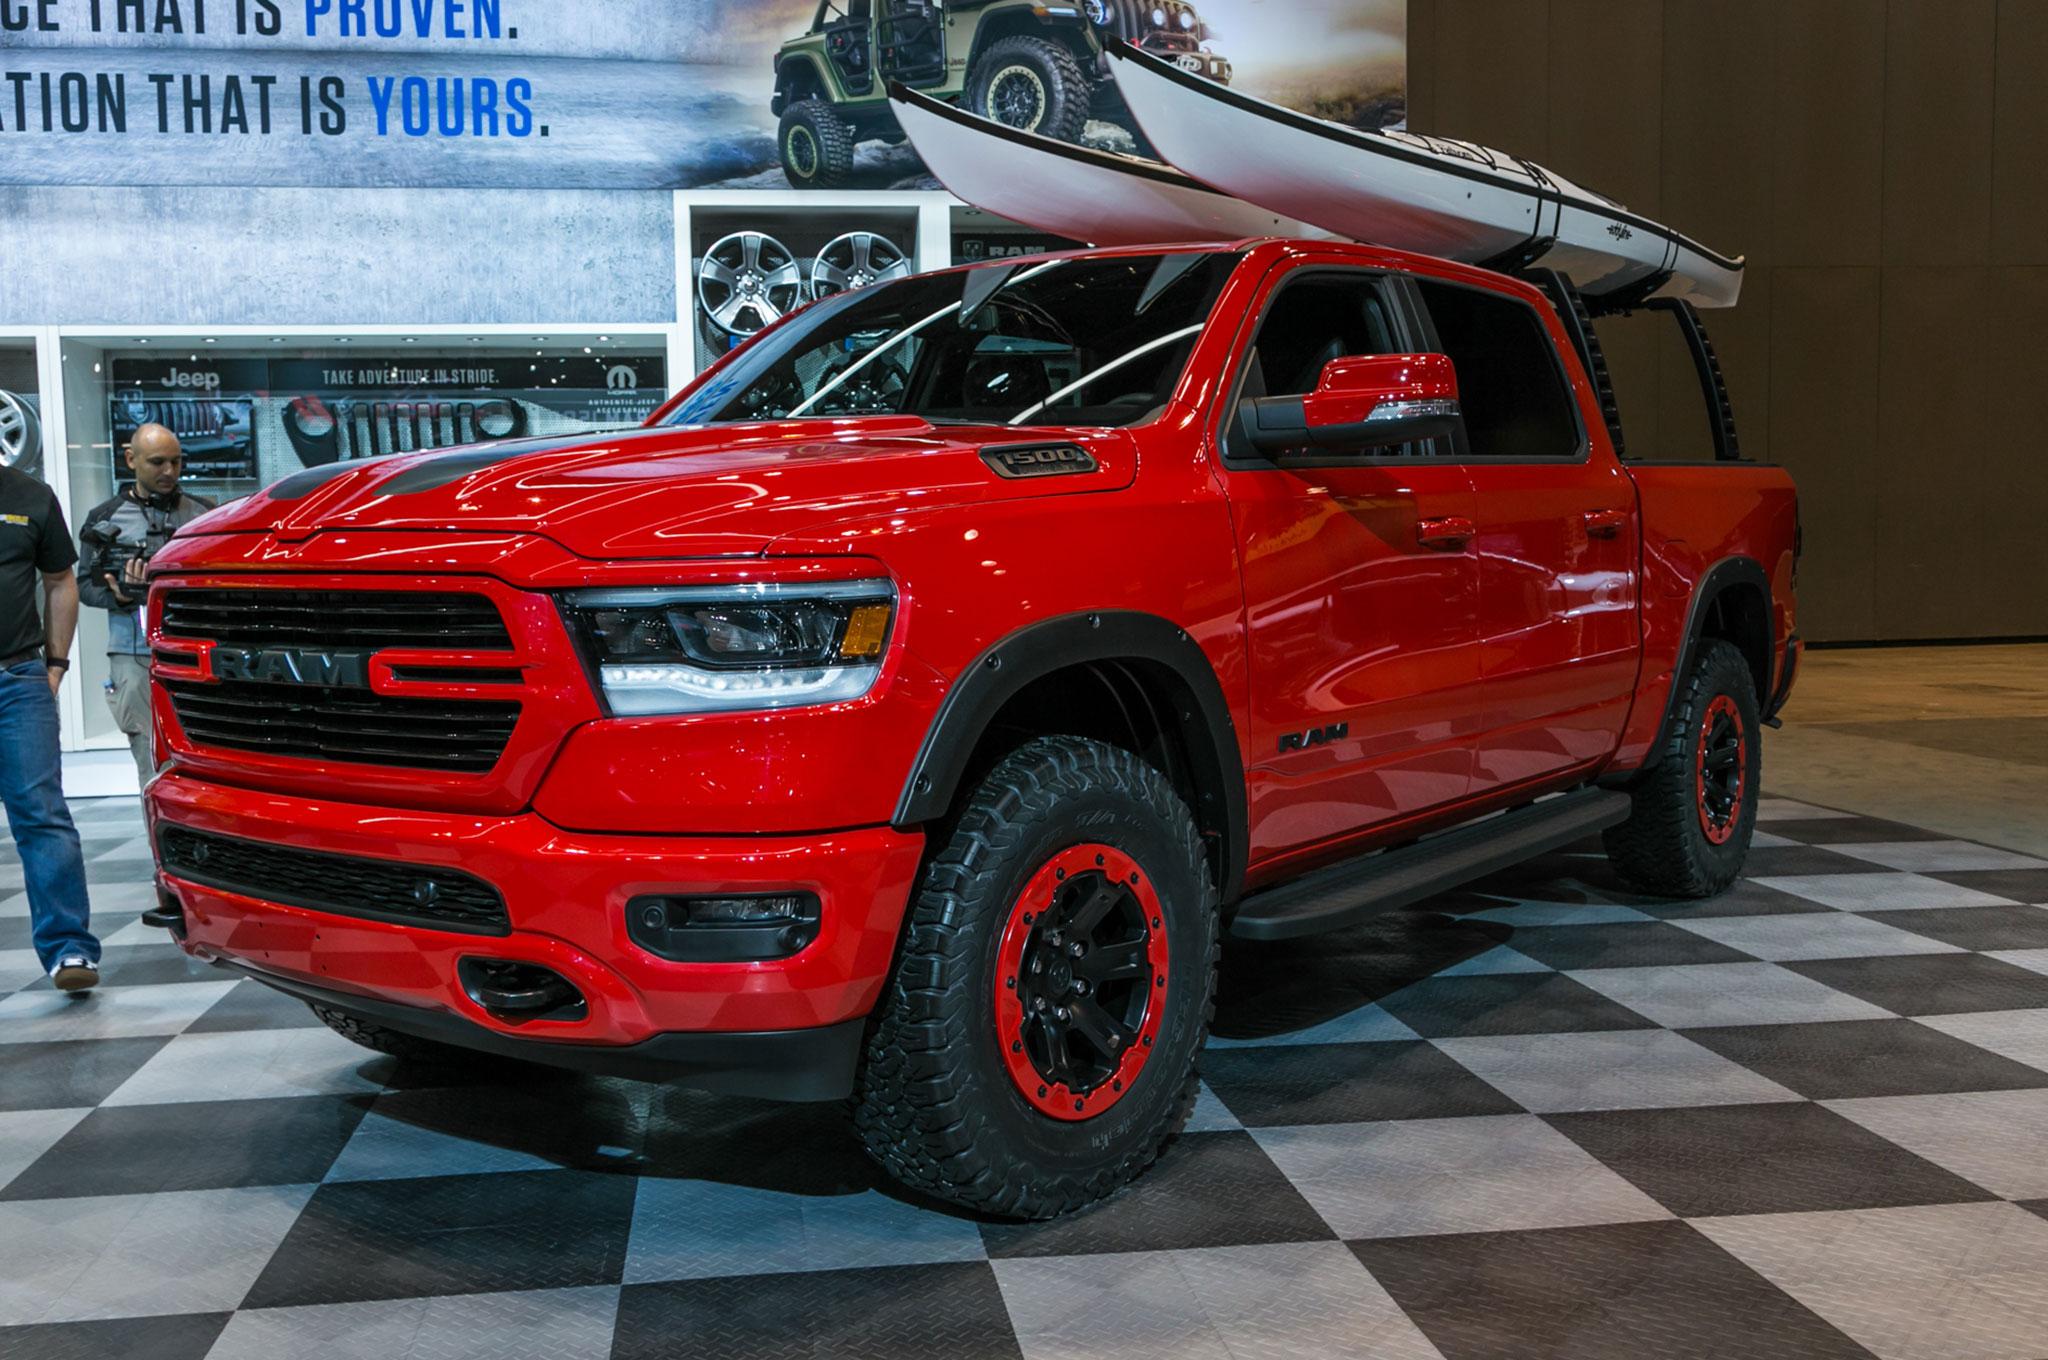 Power Wagon Build >> Mopar Preps 2019 Ram 1500 for Adventure | Automobile Magazine